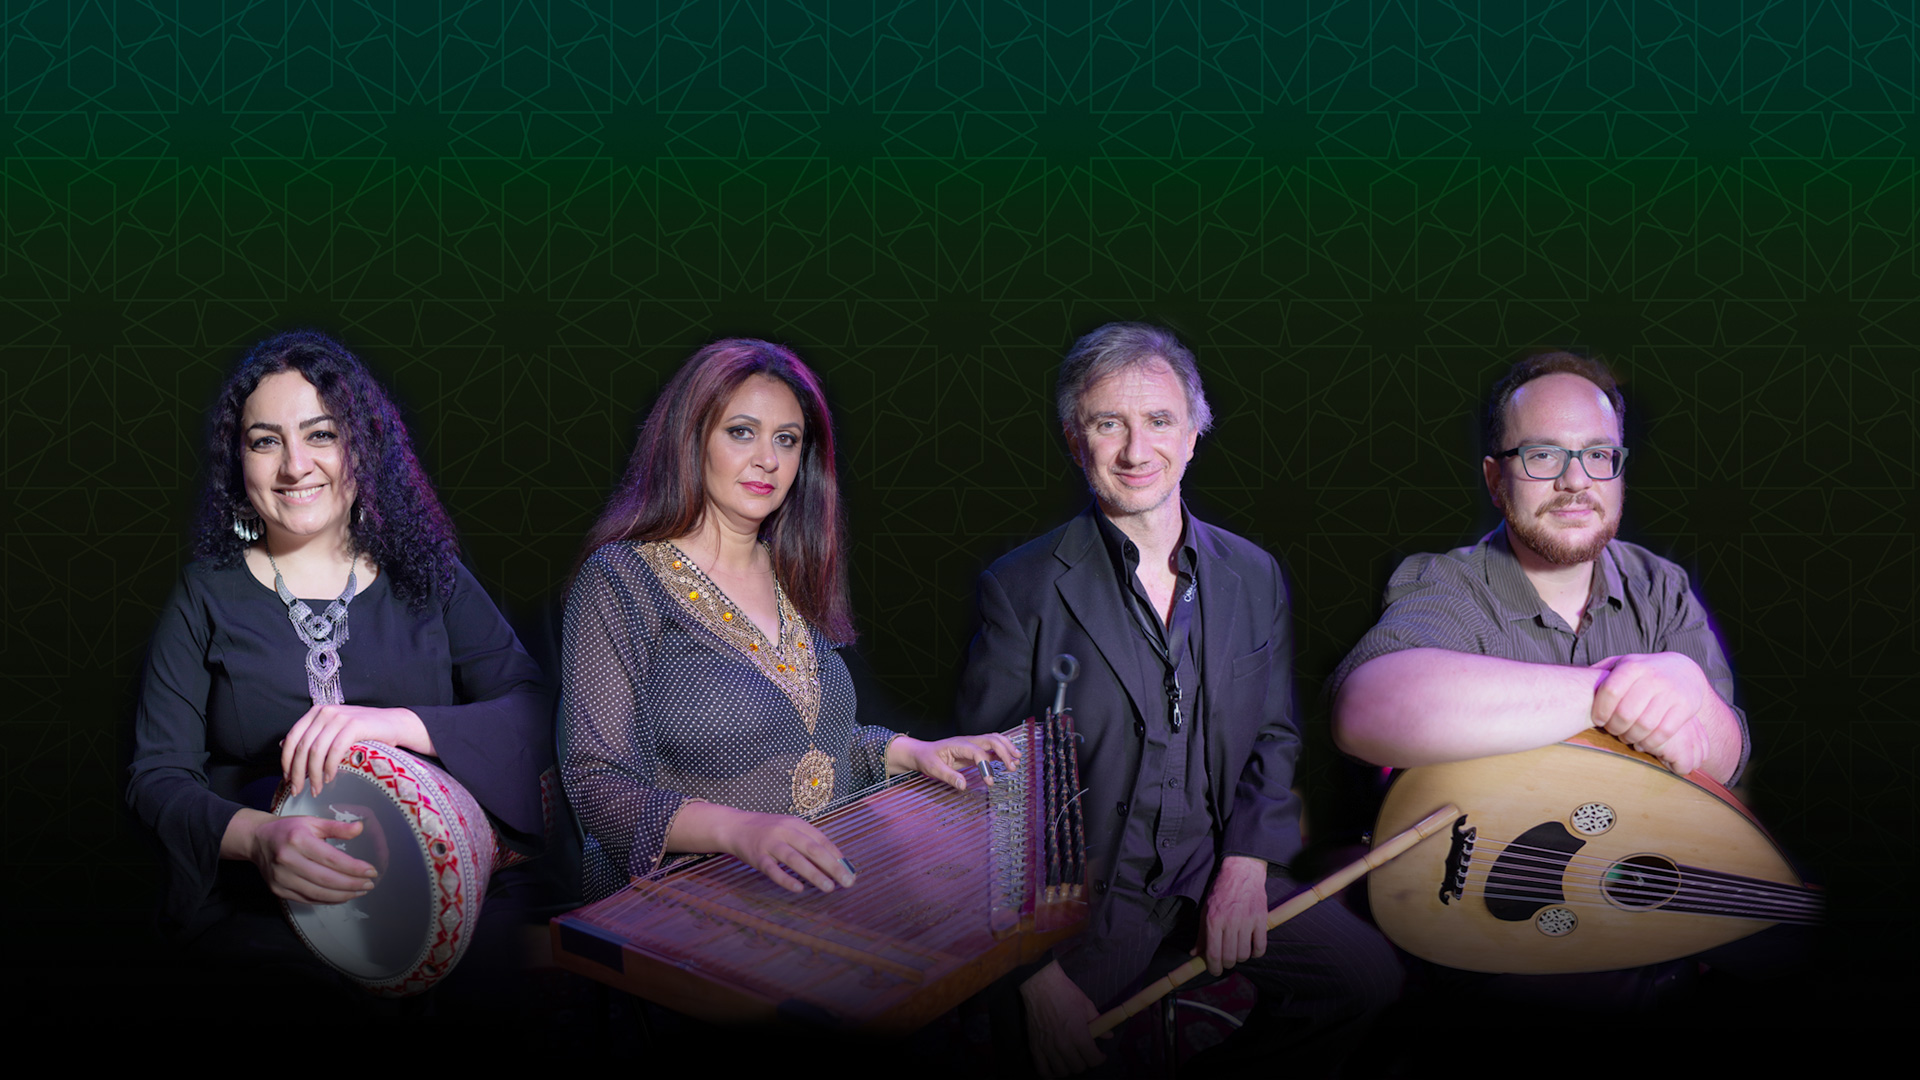 Al Qahwa - Maryem Tollar, Ernie Tollar, Demetri Petsalakis, Naghmeh Farahmand